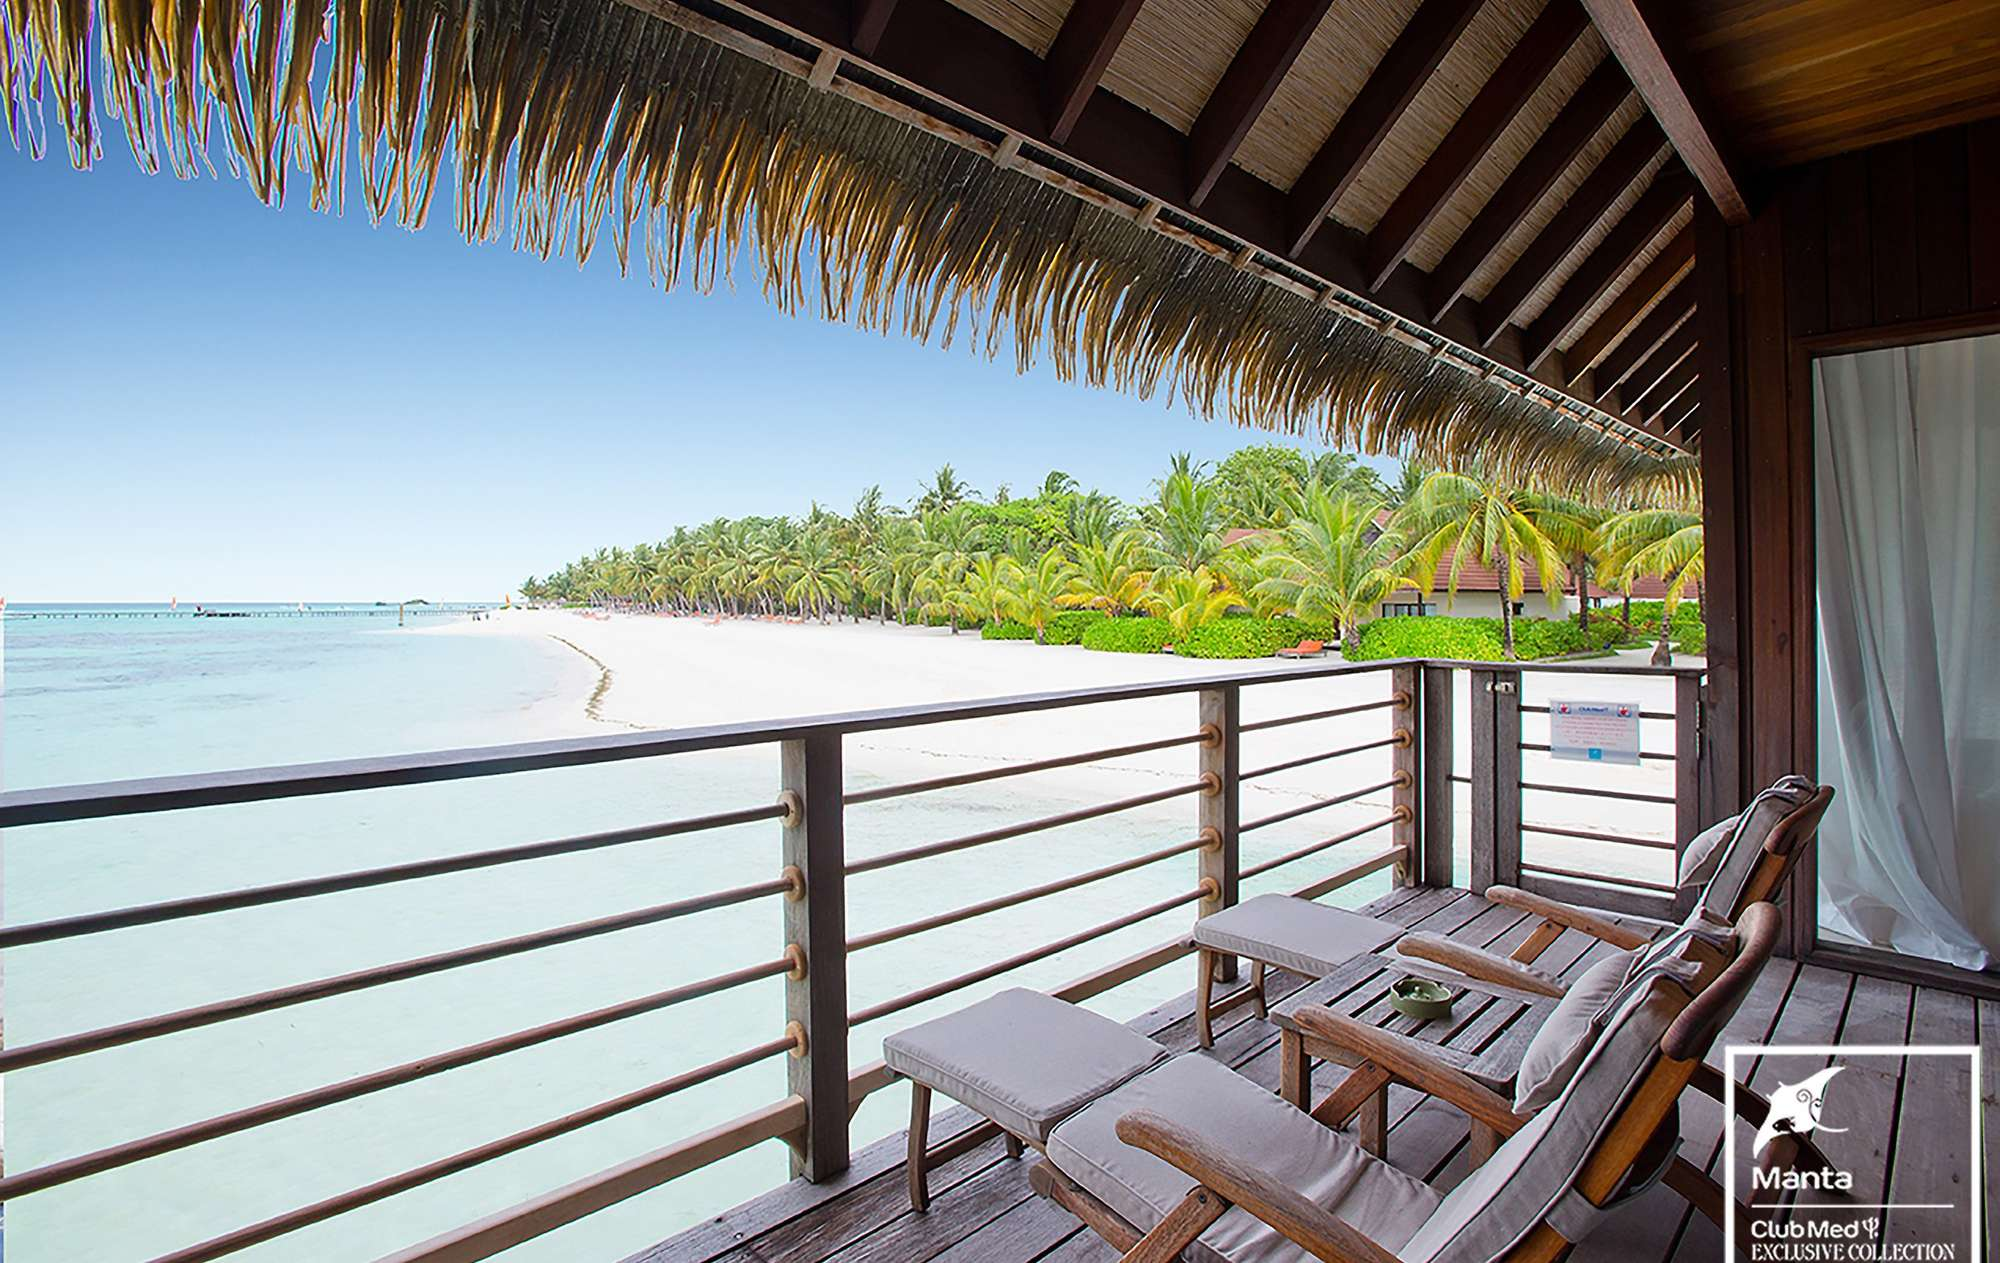 Club_med_Asie_et_Ocean_indien_Kani_suite_pillotis_4